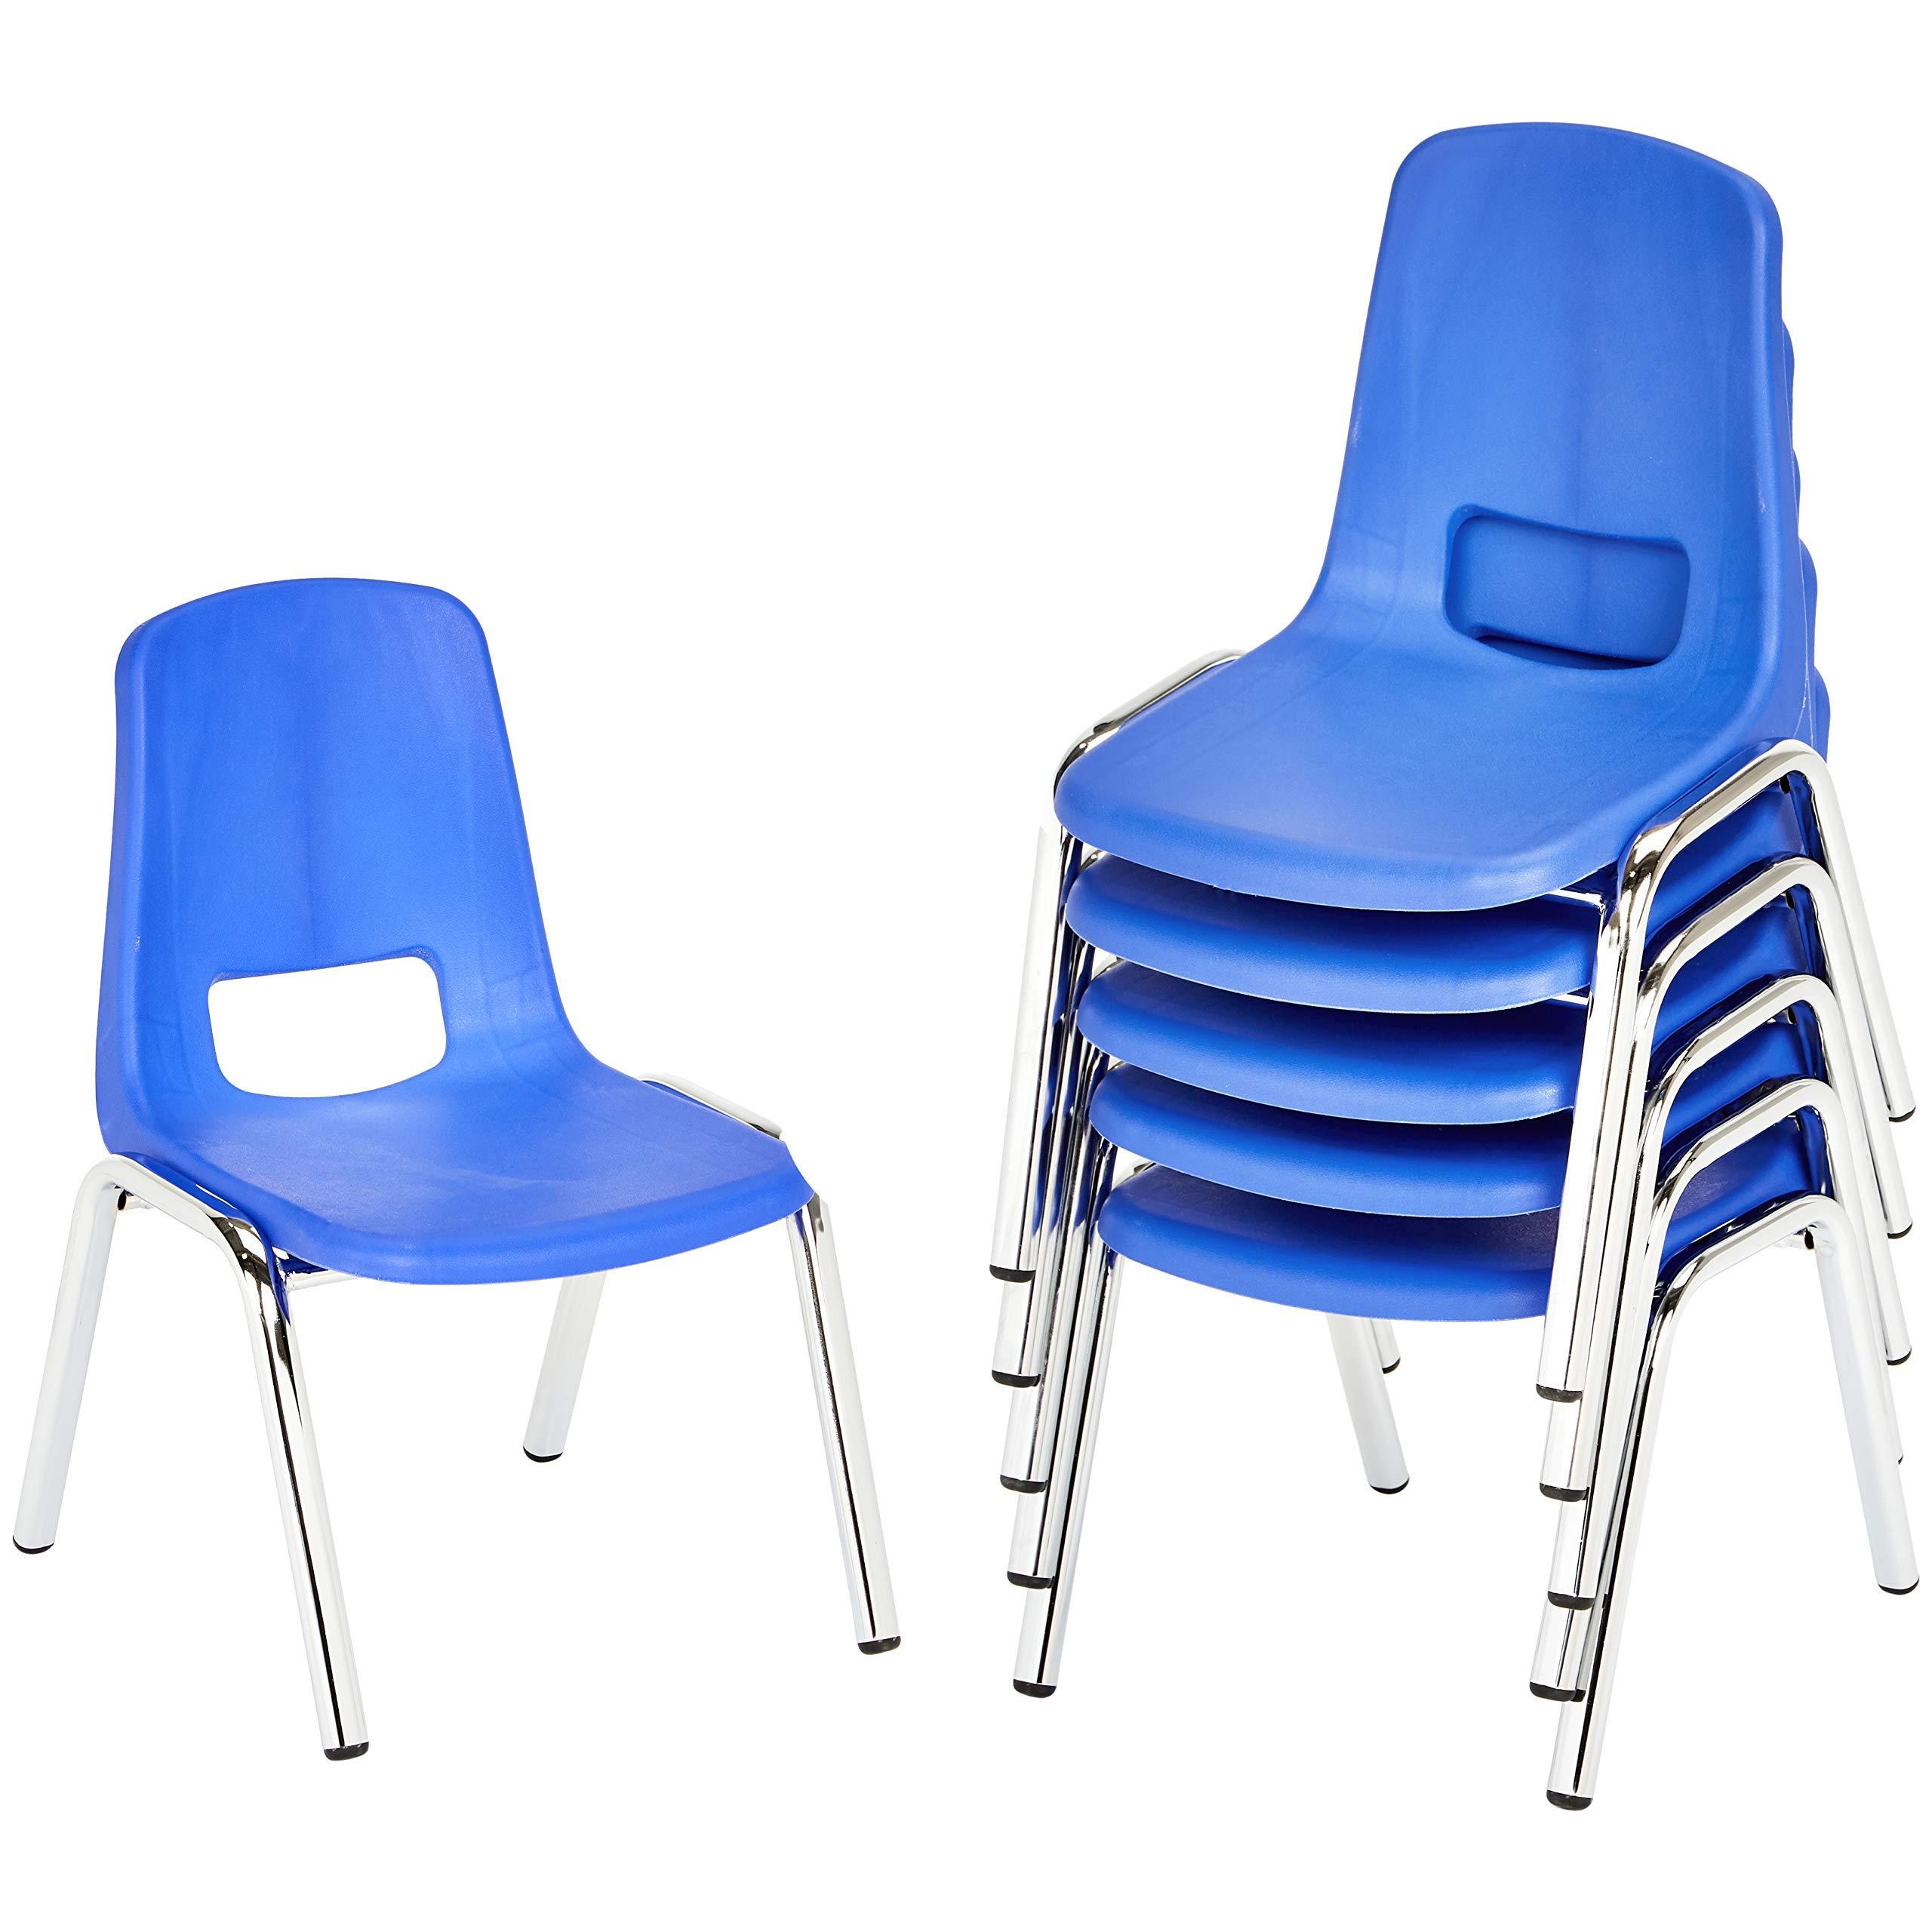 AmazonBasics 10 Inch School Classroom Stack Chair, Chrome Legs, Blue, 6-Pack